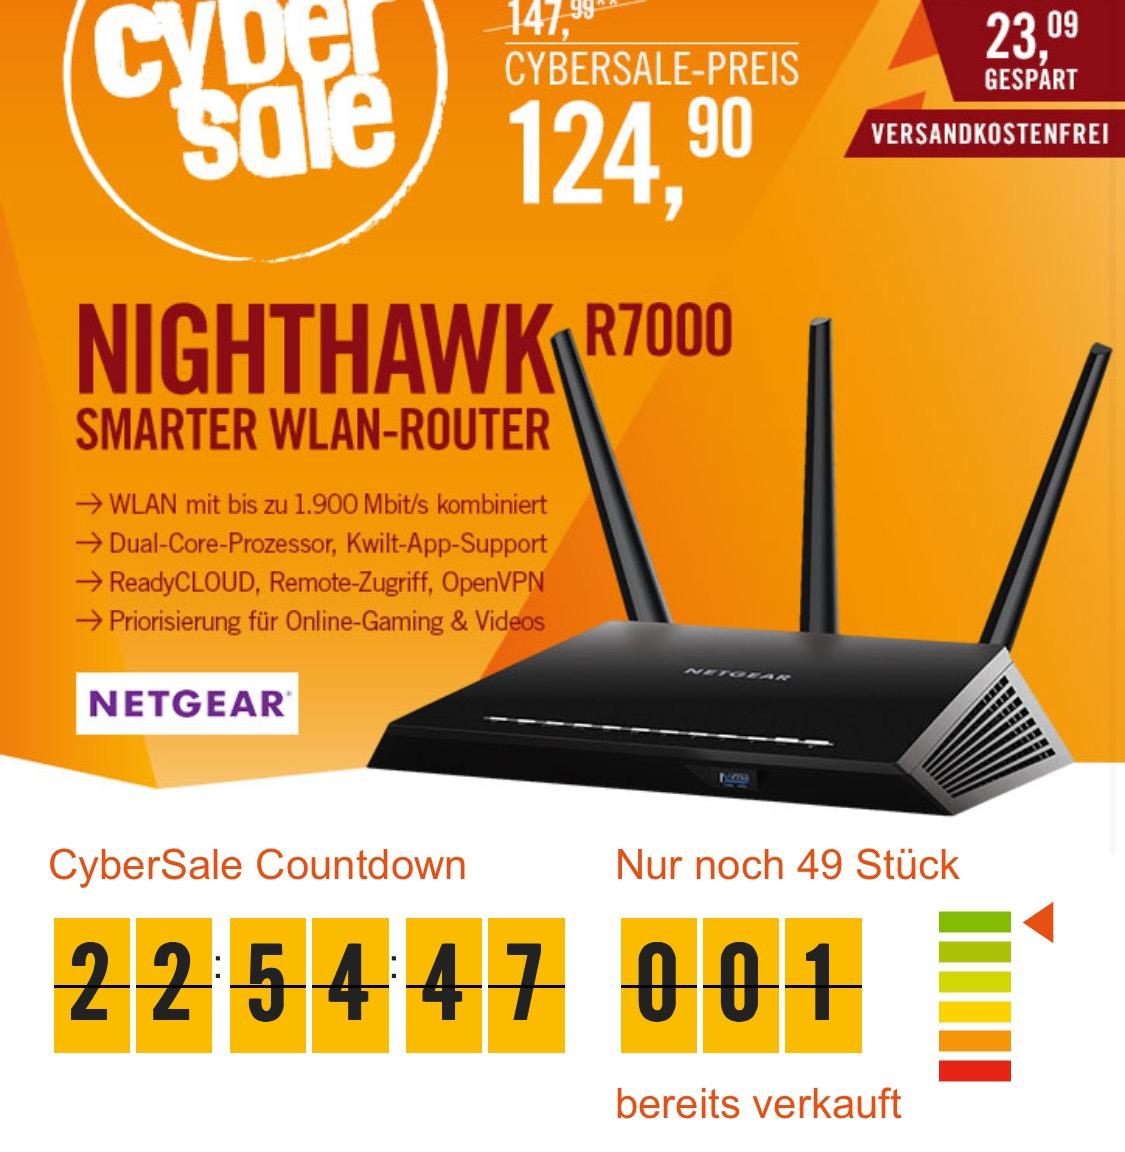 [cyberport.de] Netgear Nighthawk R7000 Wlan Router